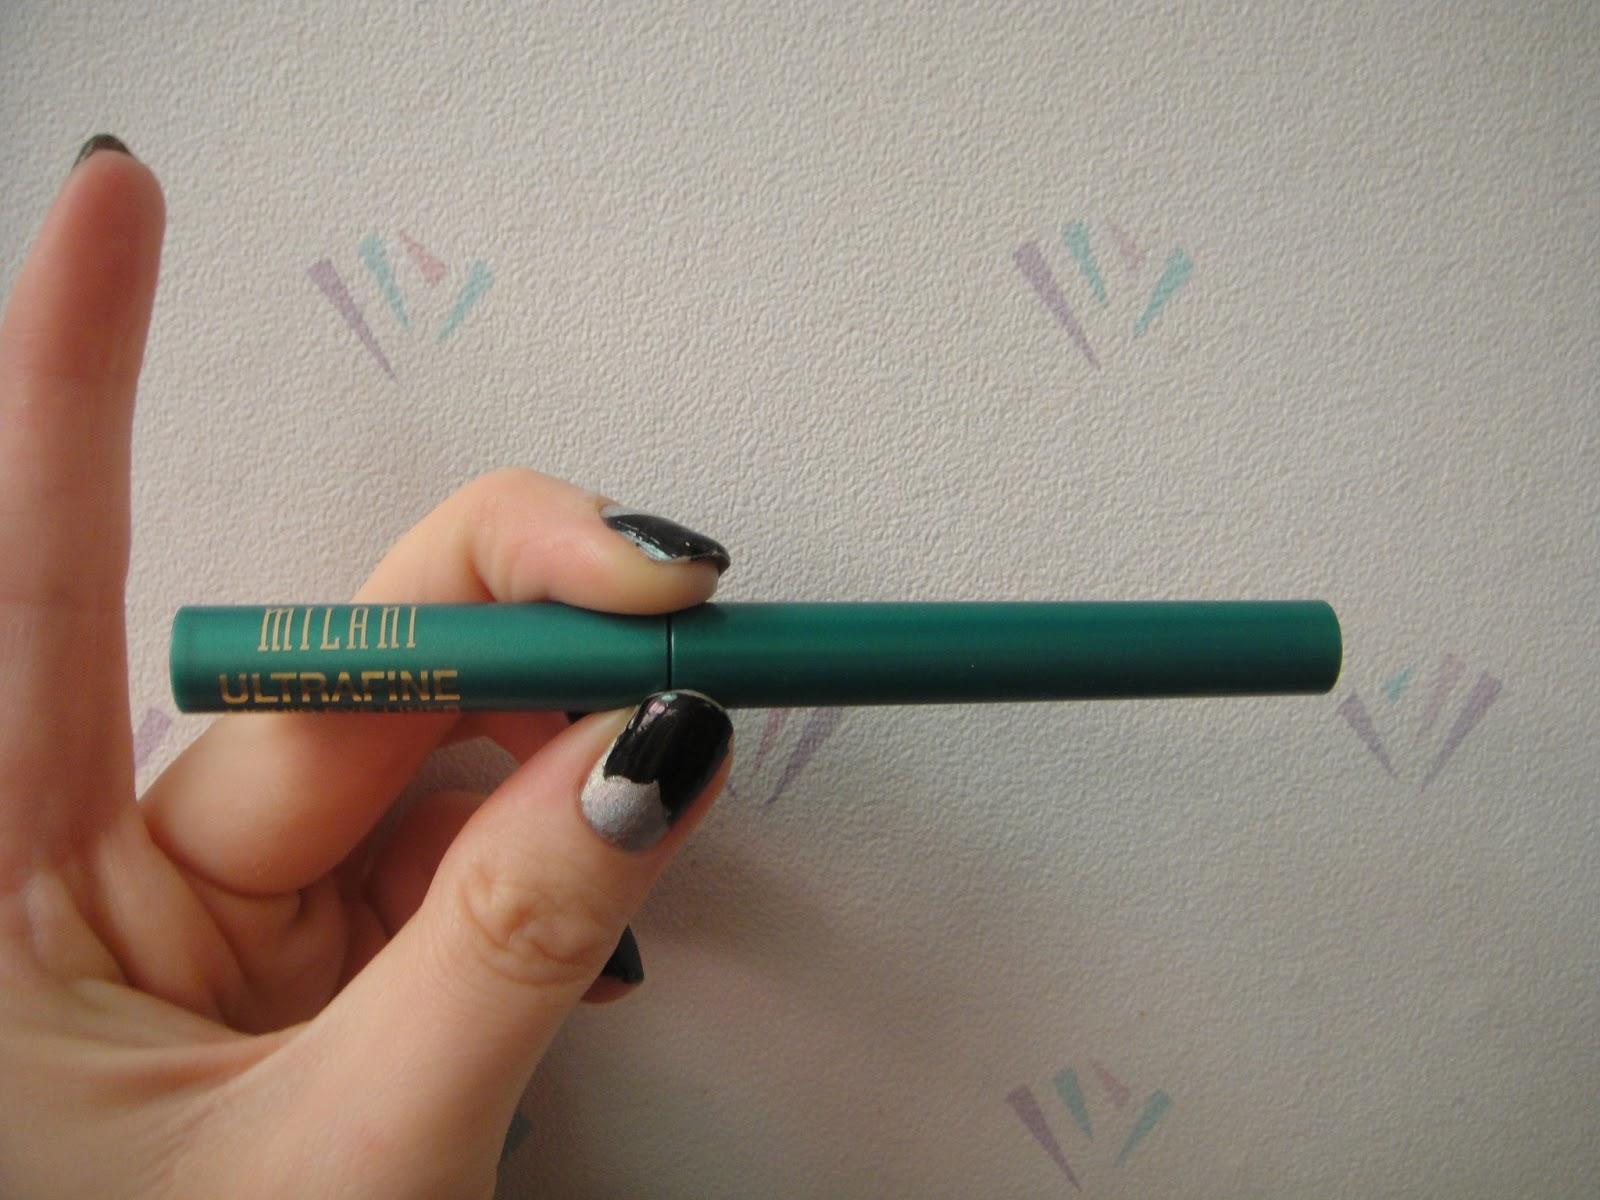 Milani ultrafine liquid liner in emerald glisten Review and Swatches